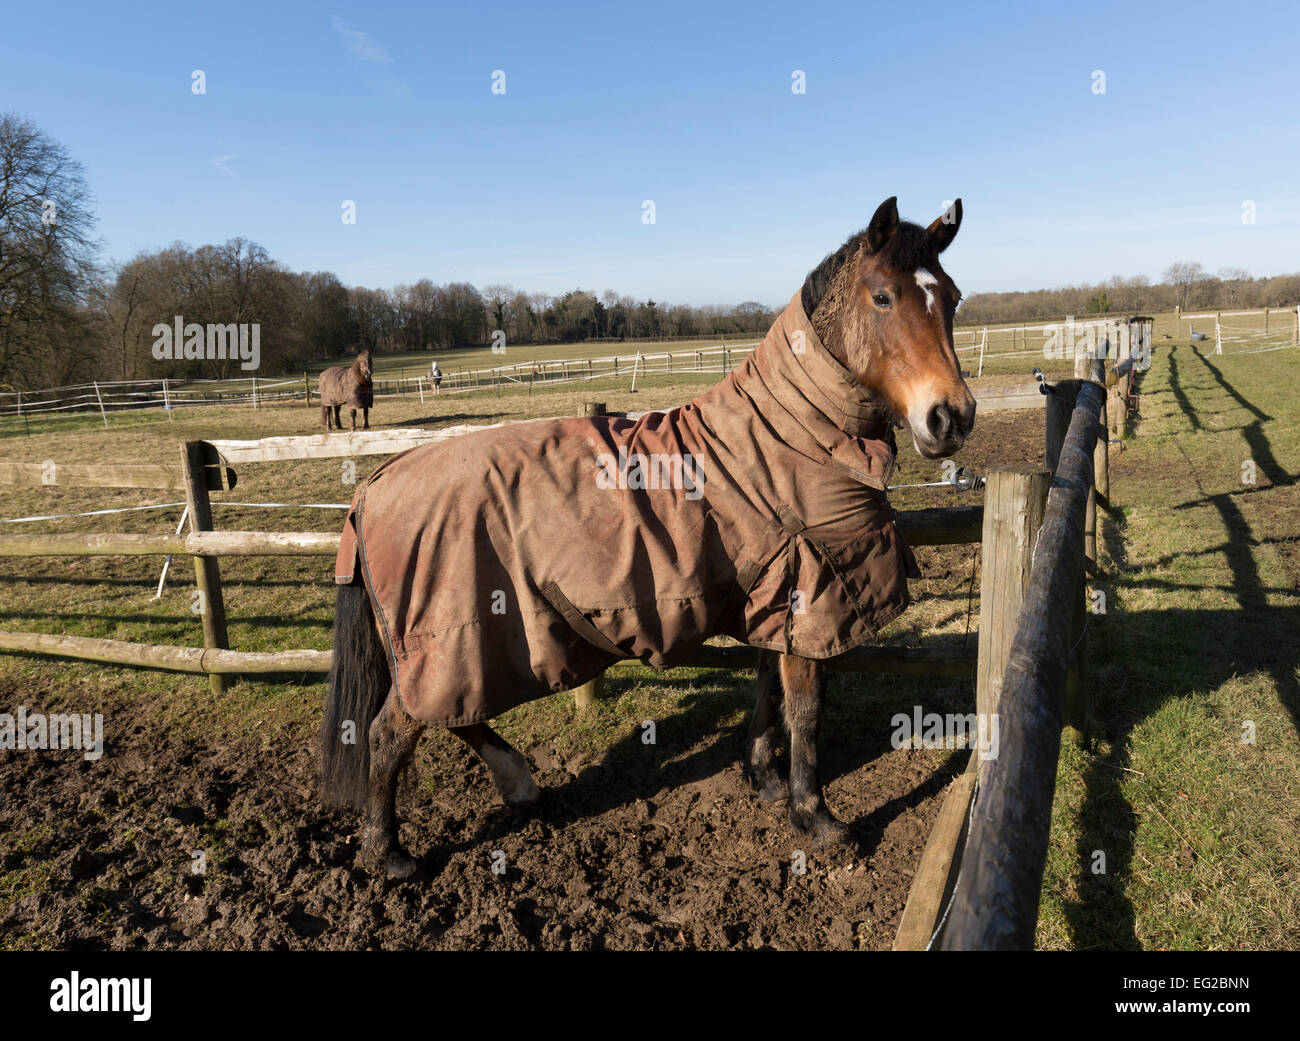 Cheval en paddock avec couverture d'hiver, St Briavels, Gloucestershire, England, UK Photo Stock